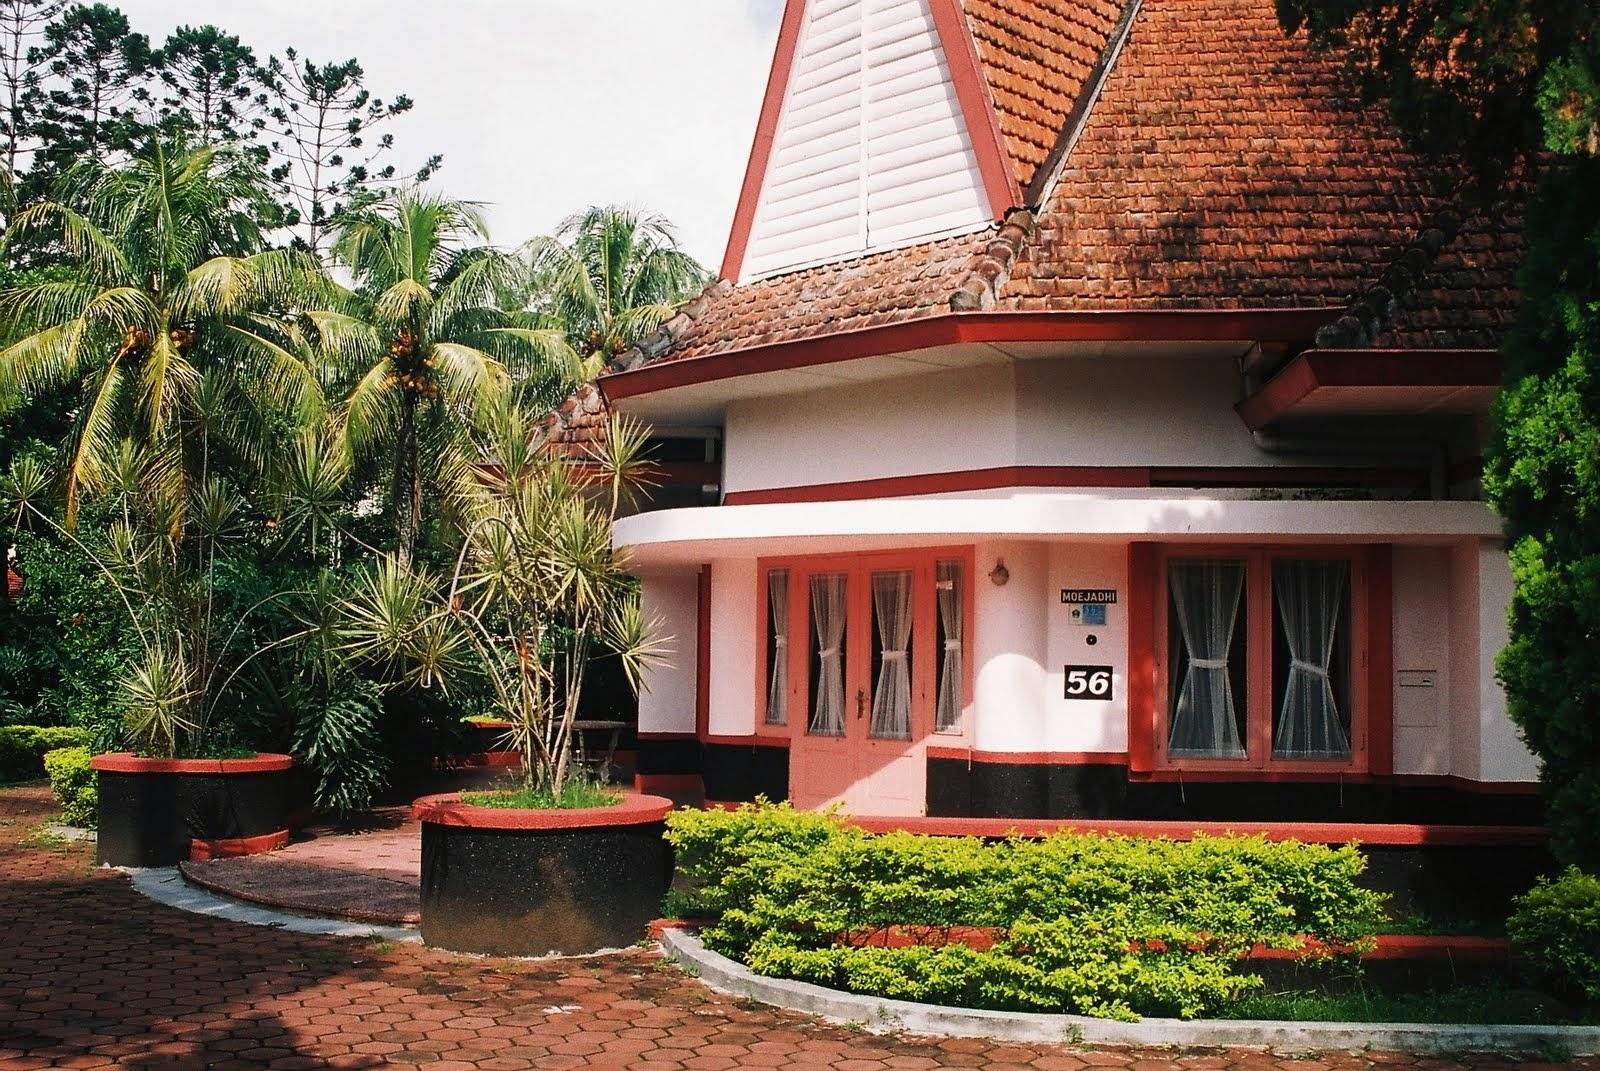 Arsitektur Kolonial Indonesia Arsitektur Kolonial Indonesia